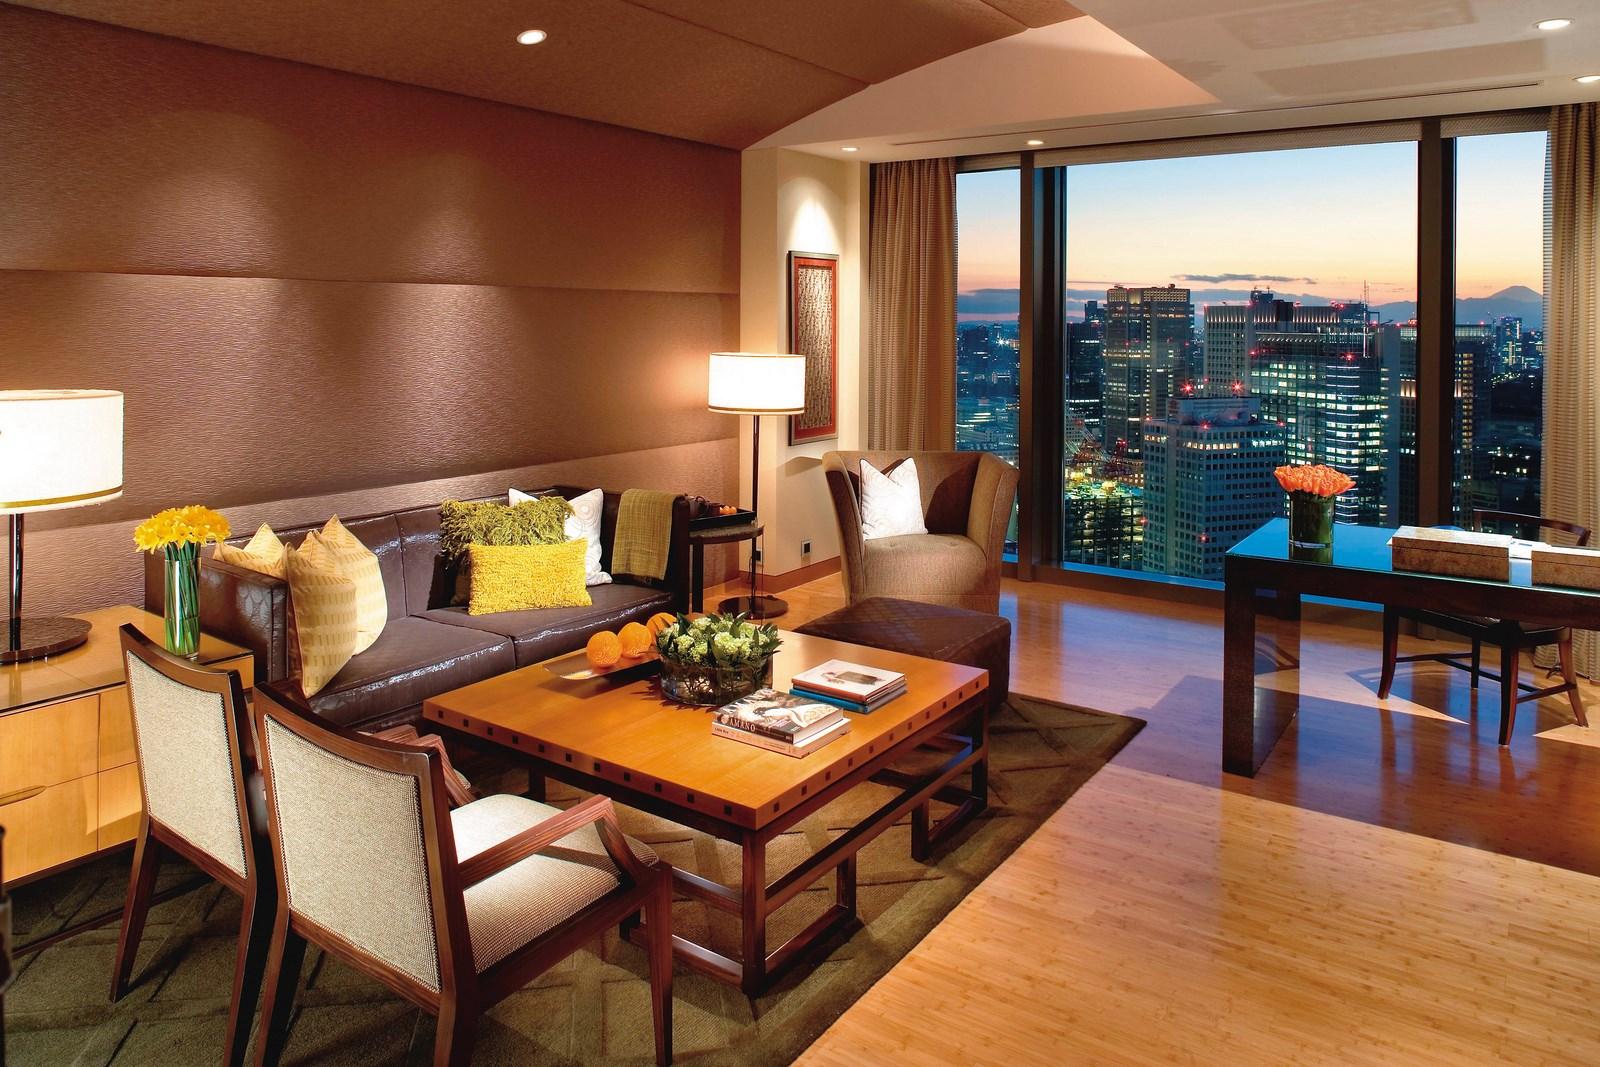 tokyo-suite-mandarin-suite-living-room-01 [1600x1200]